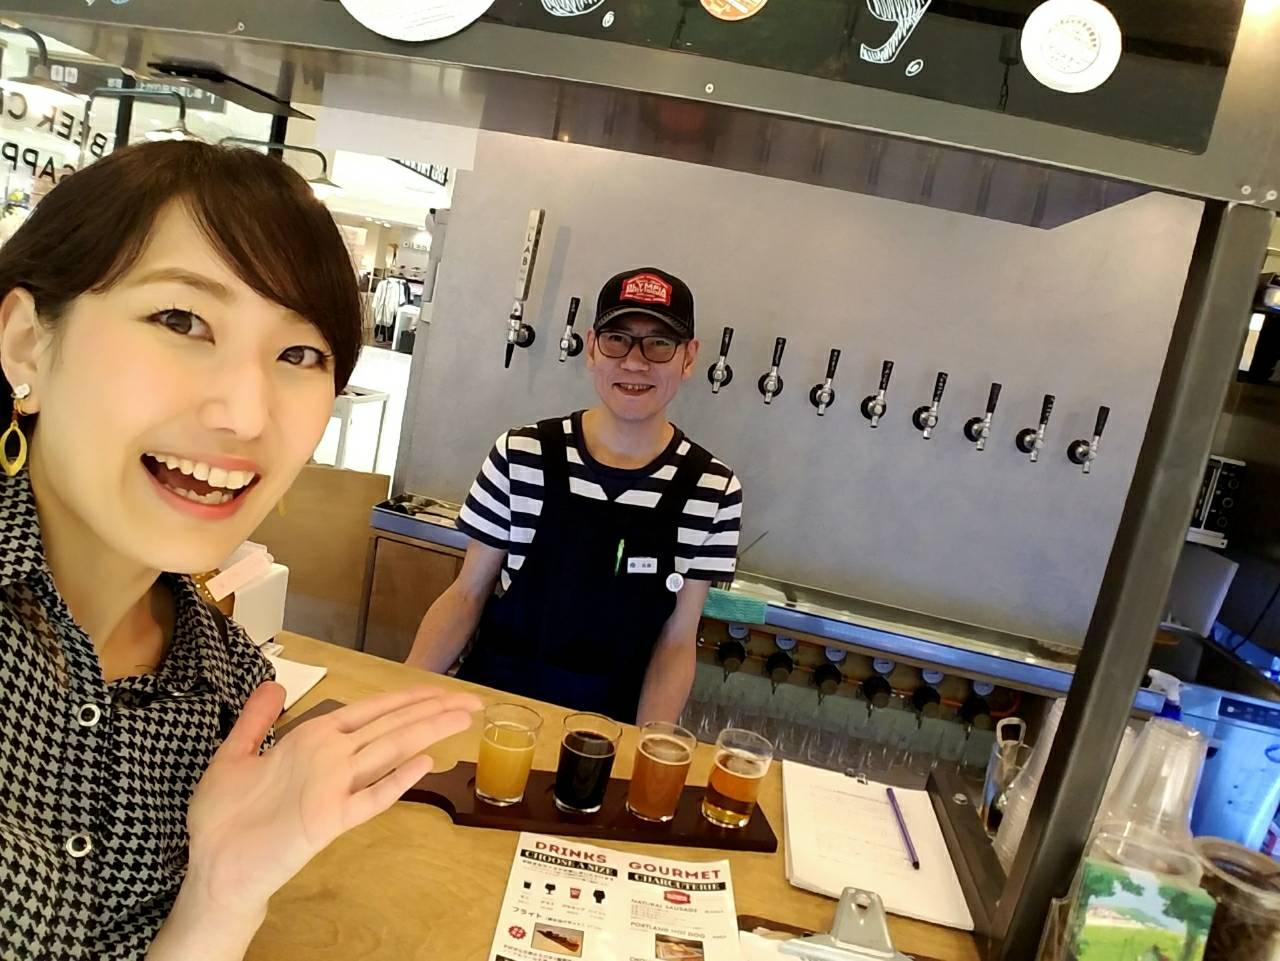 ★KiKiYOCOCHO(大丸札幌店)には素敵なお店たくさんあります!!★